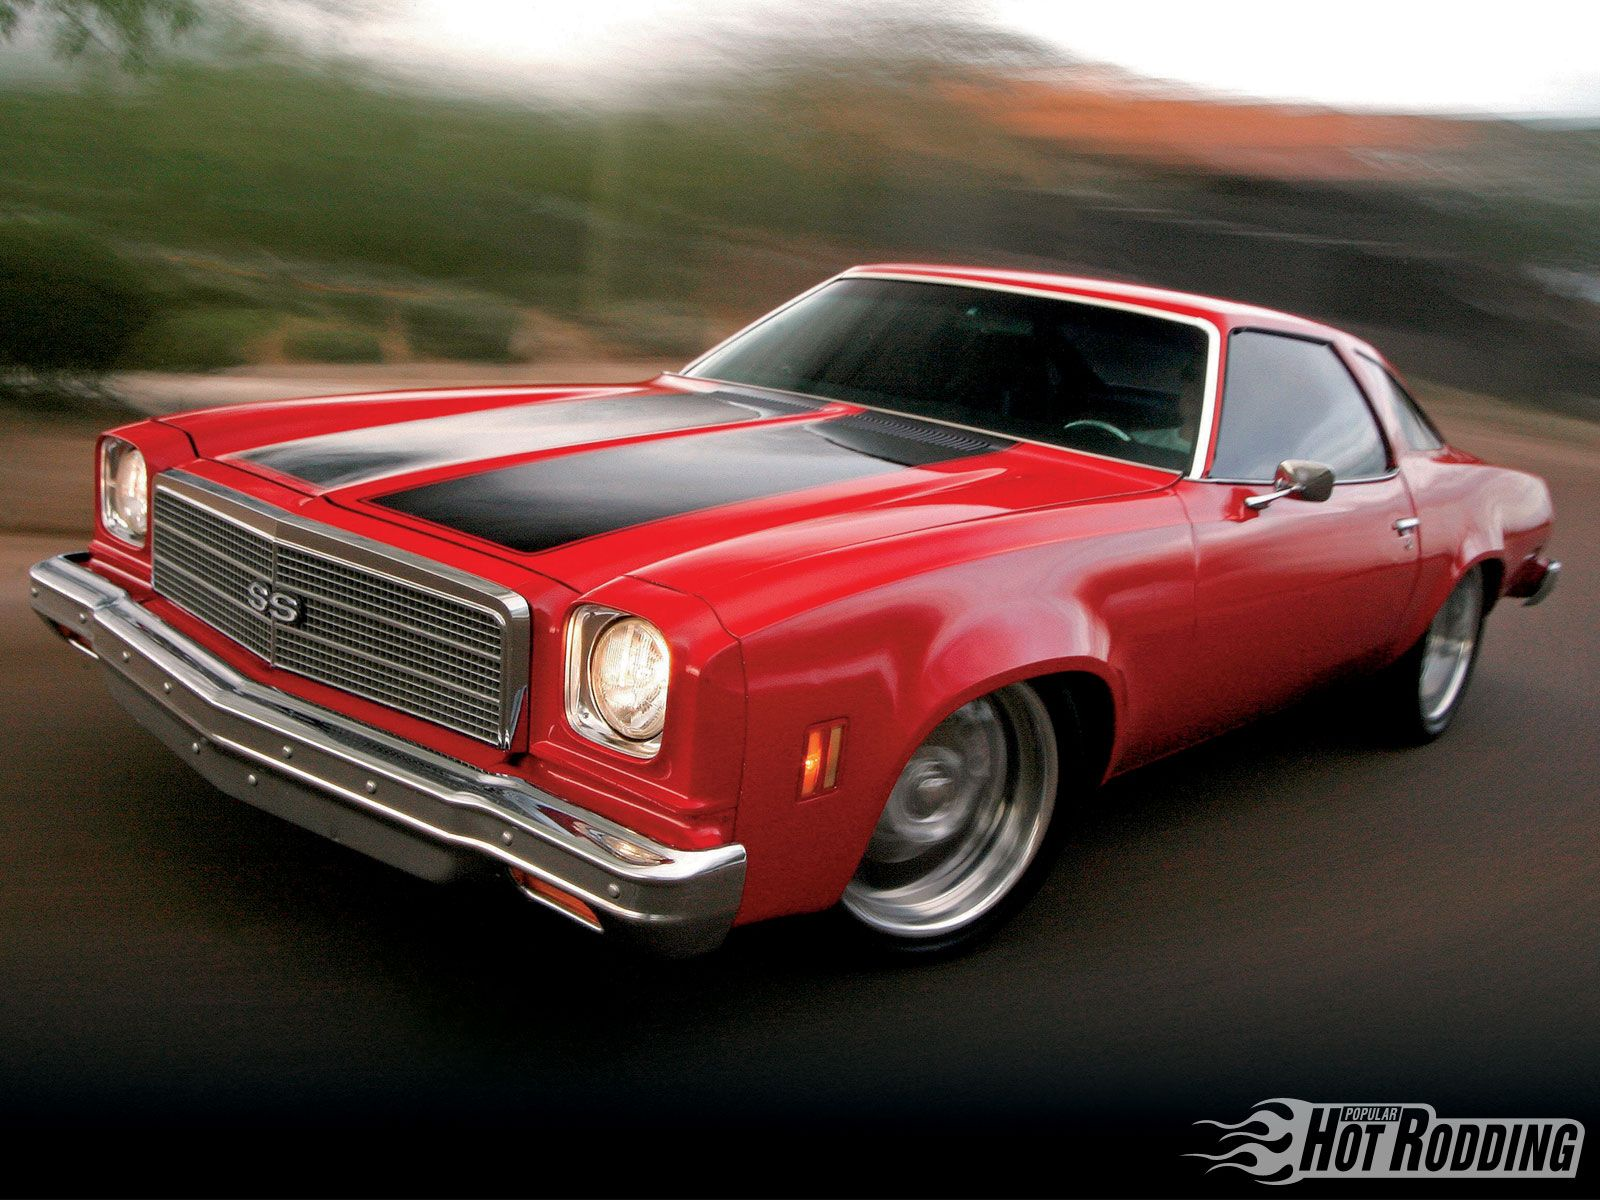 1974 Chevrolet Chevelle Malibu Chevy 383 Small Block Engine Hot